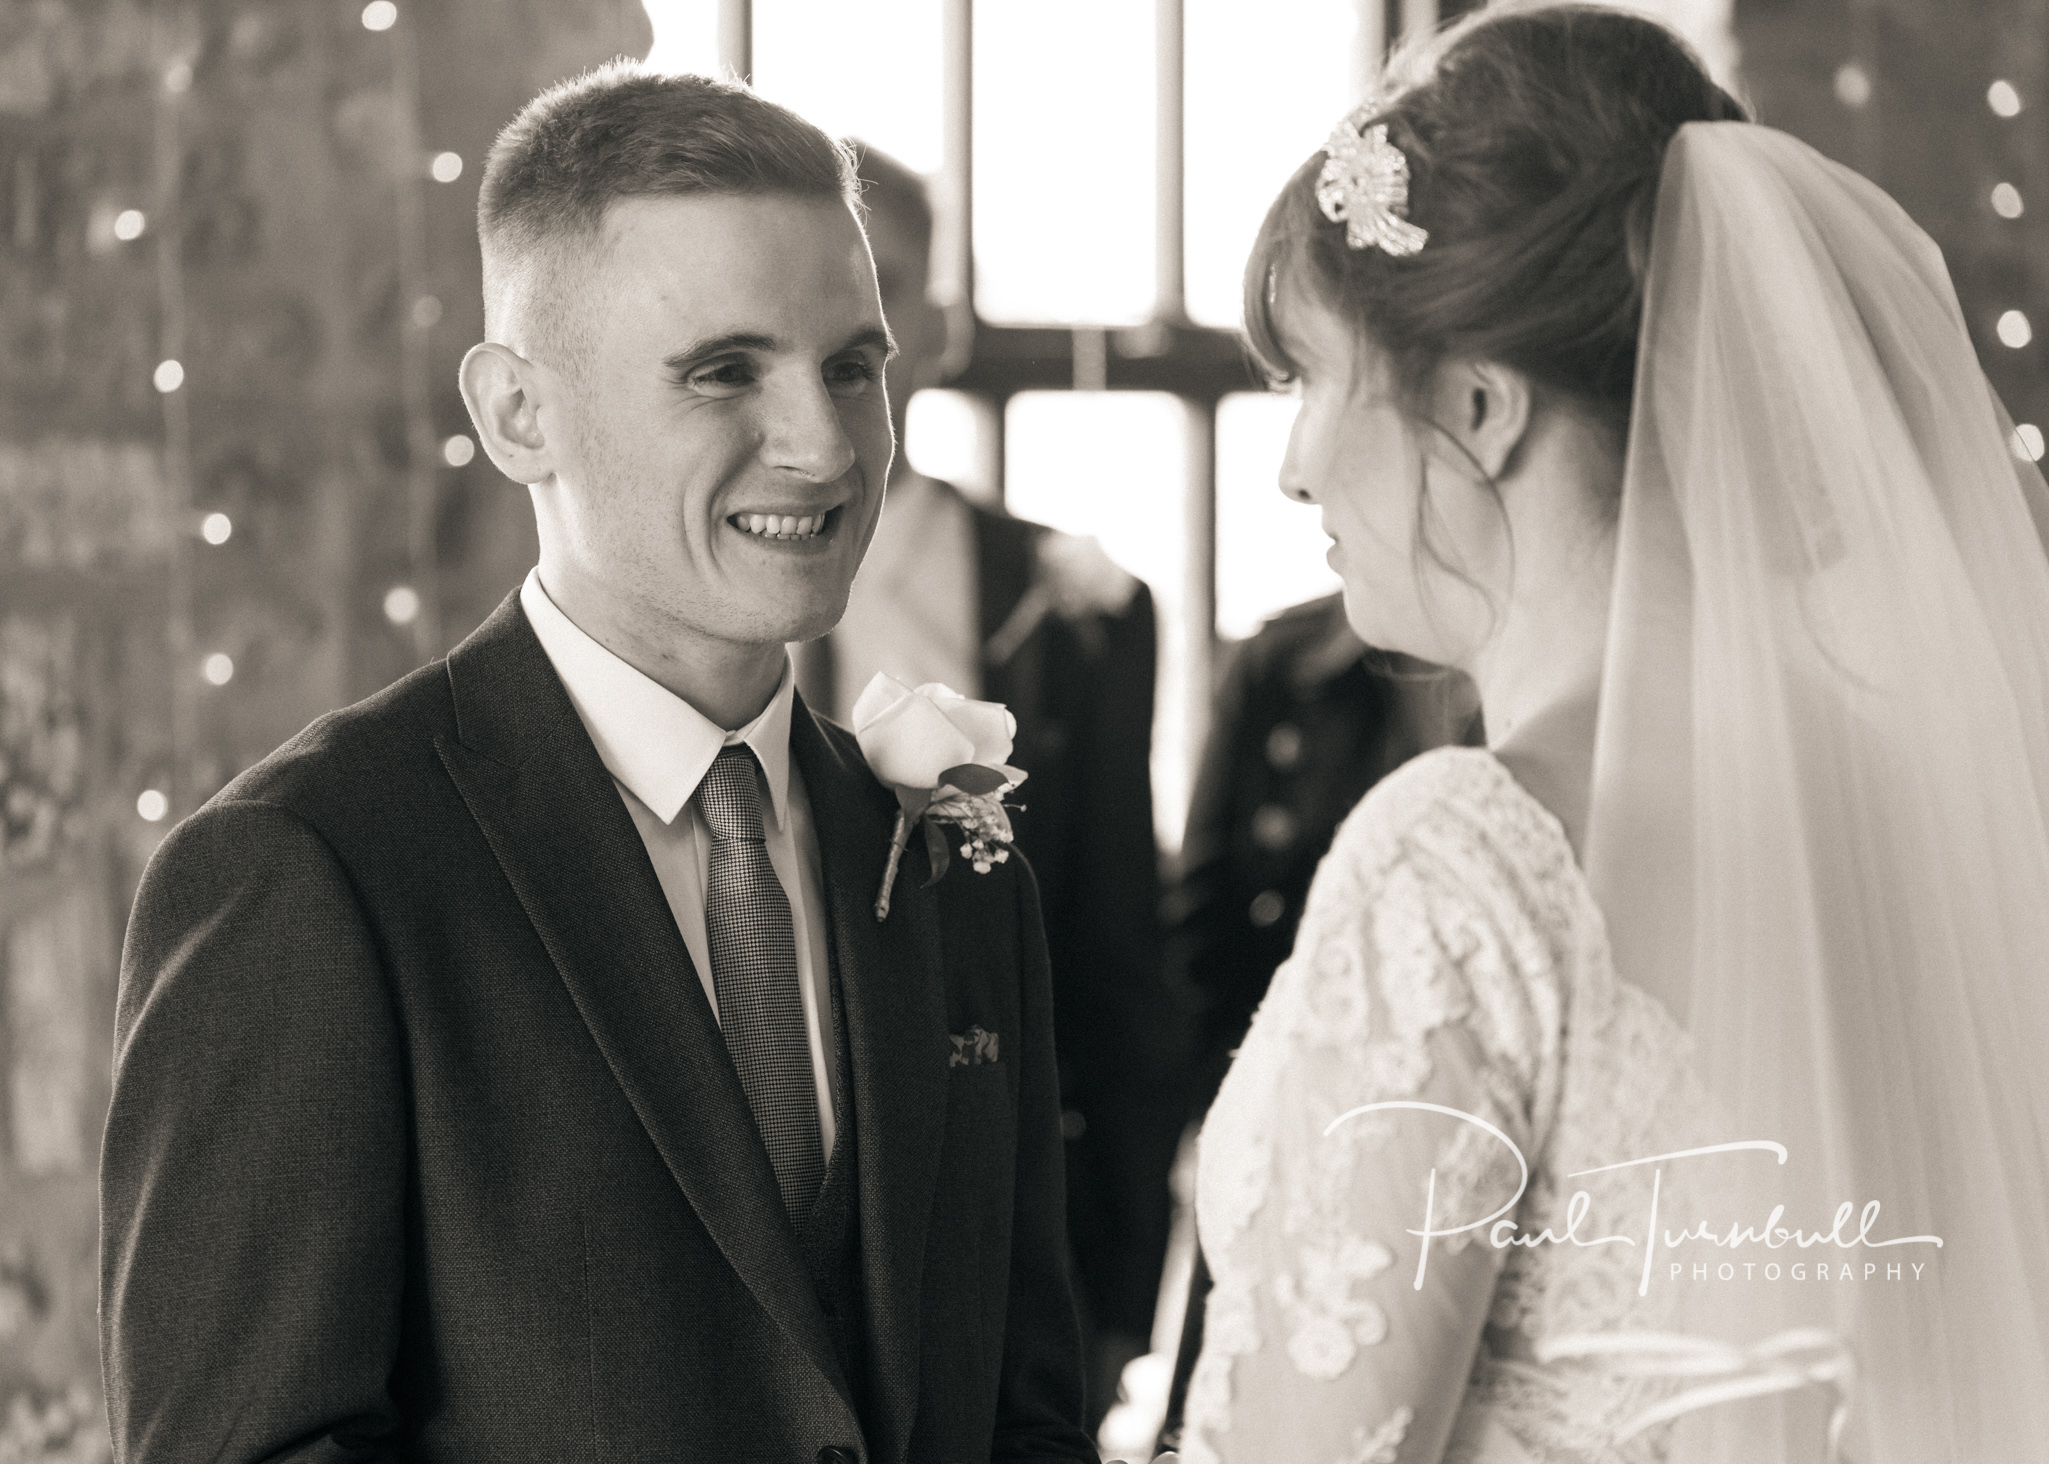 wedding-photographer-raven-hall-ravenscroft--scarborough-yorkshire-lucy-ryan-044.jpg